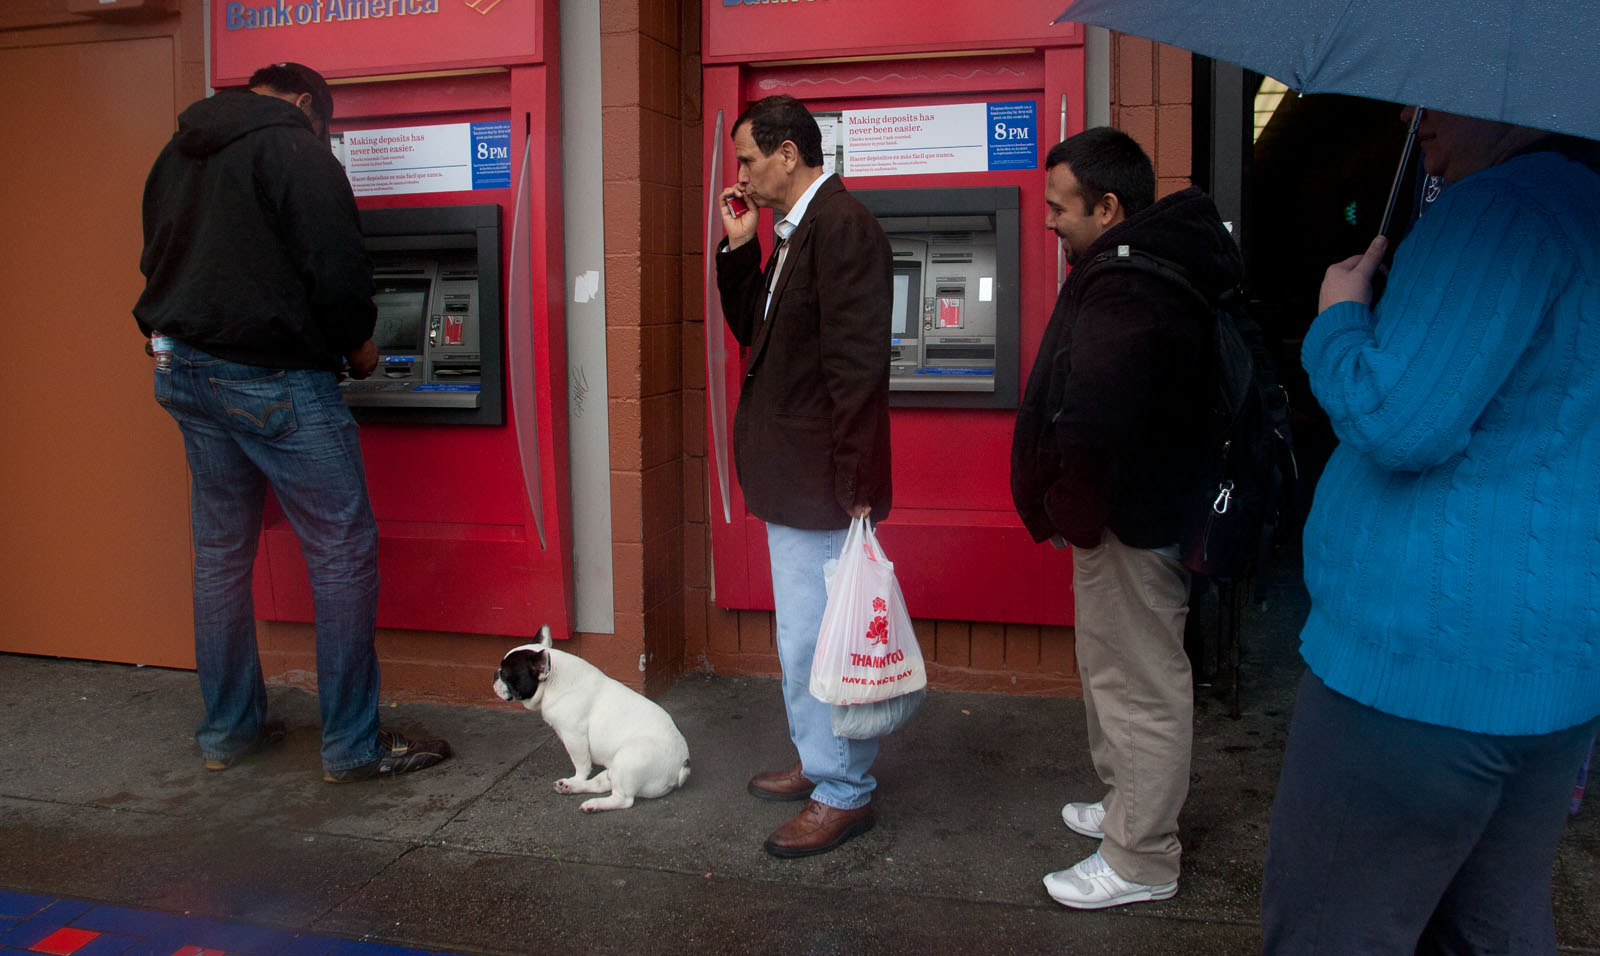 Dog Waits for Cash